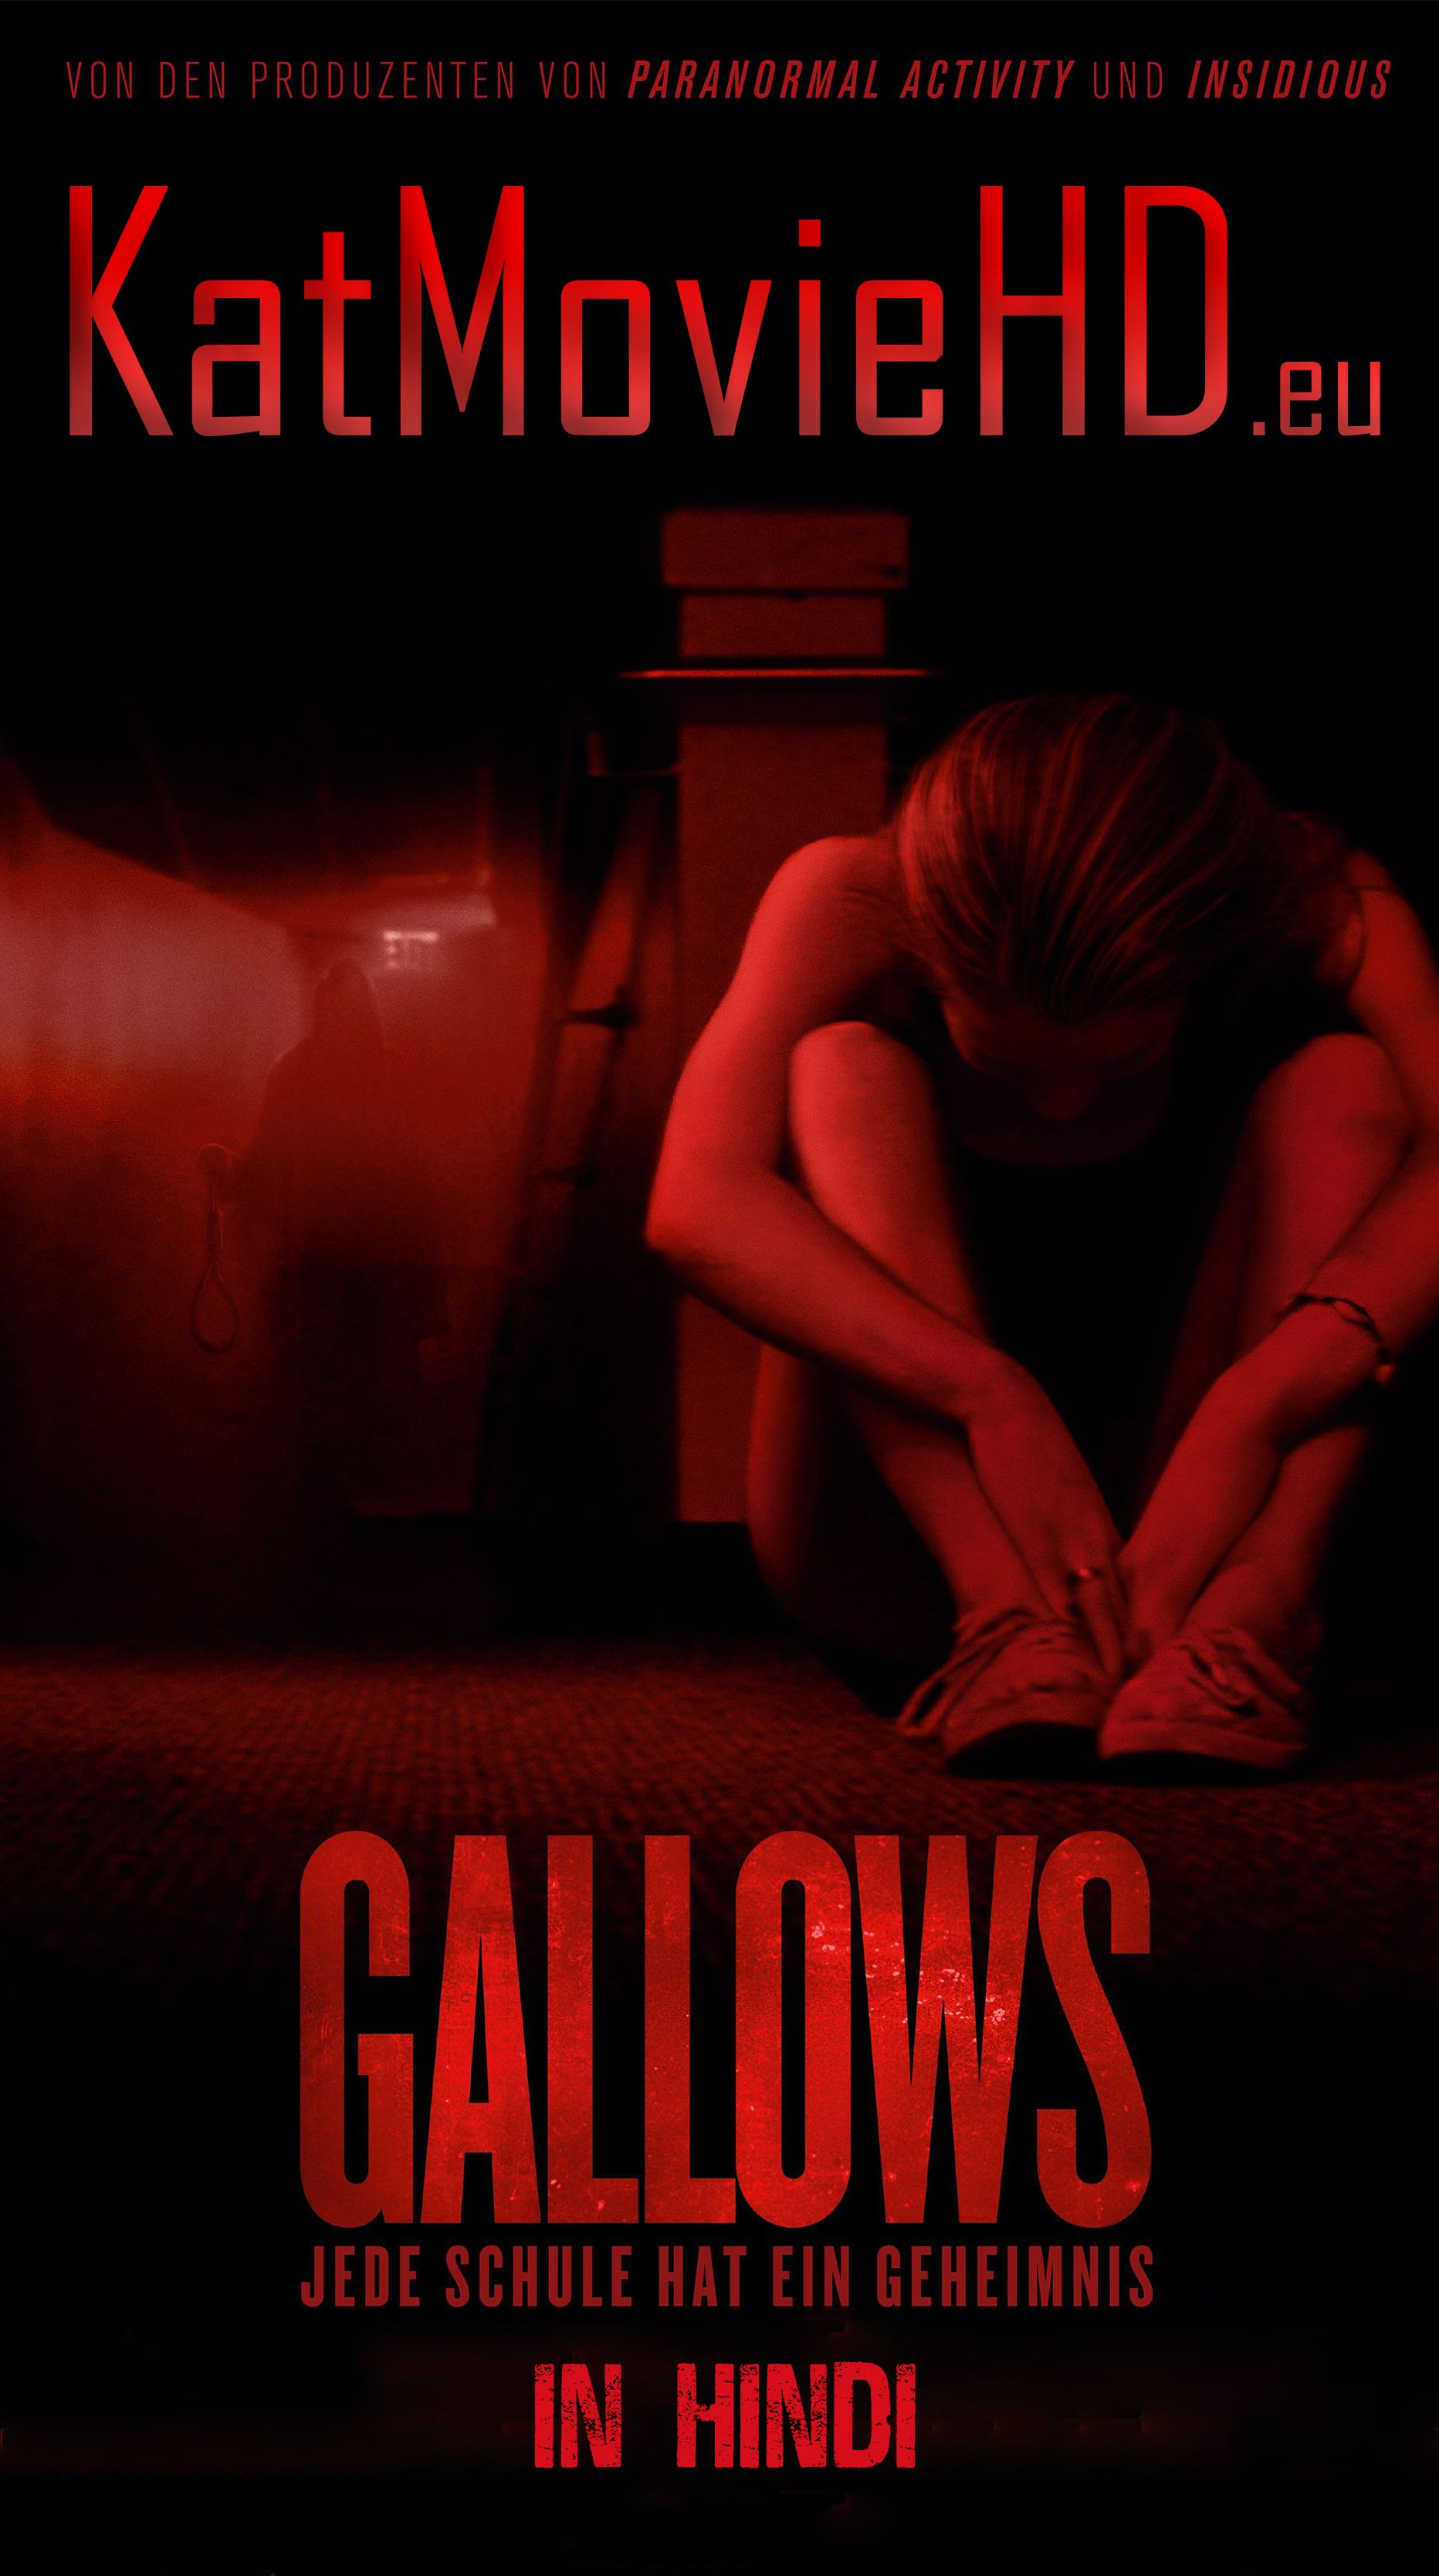 The Gallows 2015 Hindi Dd 5 1 Thriller Film Thriller Gallows